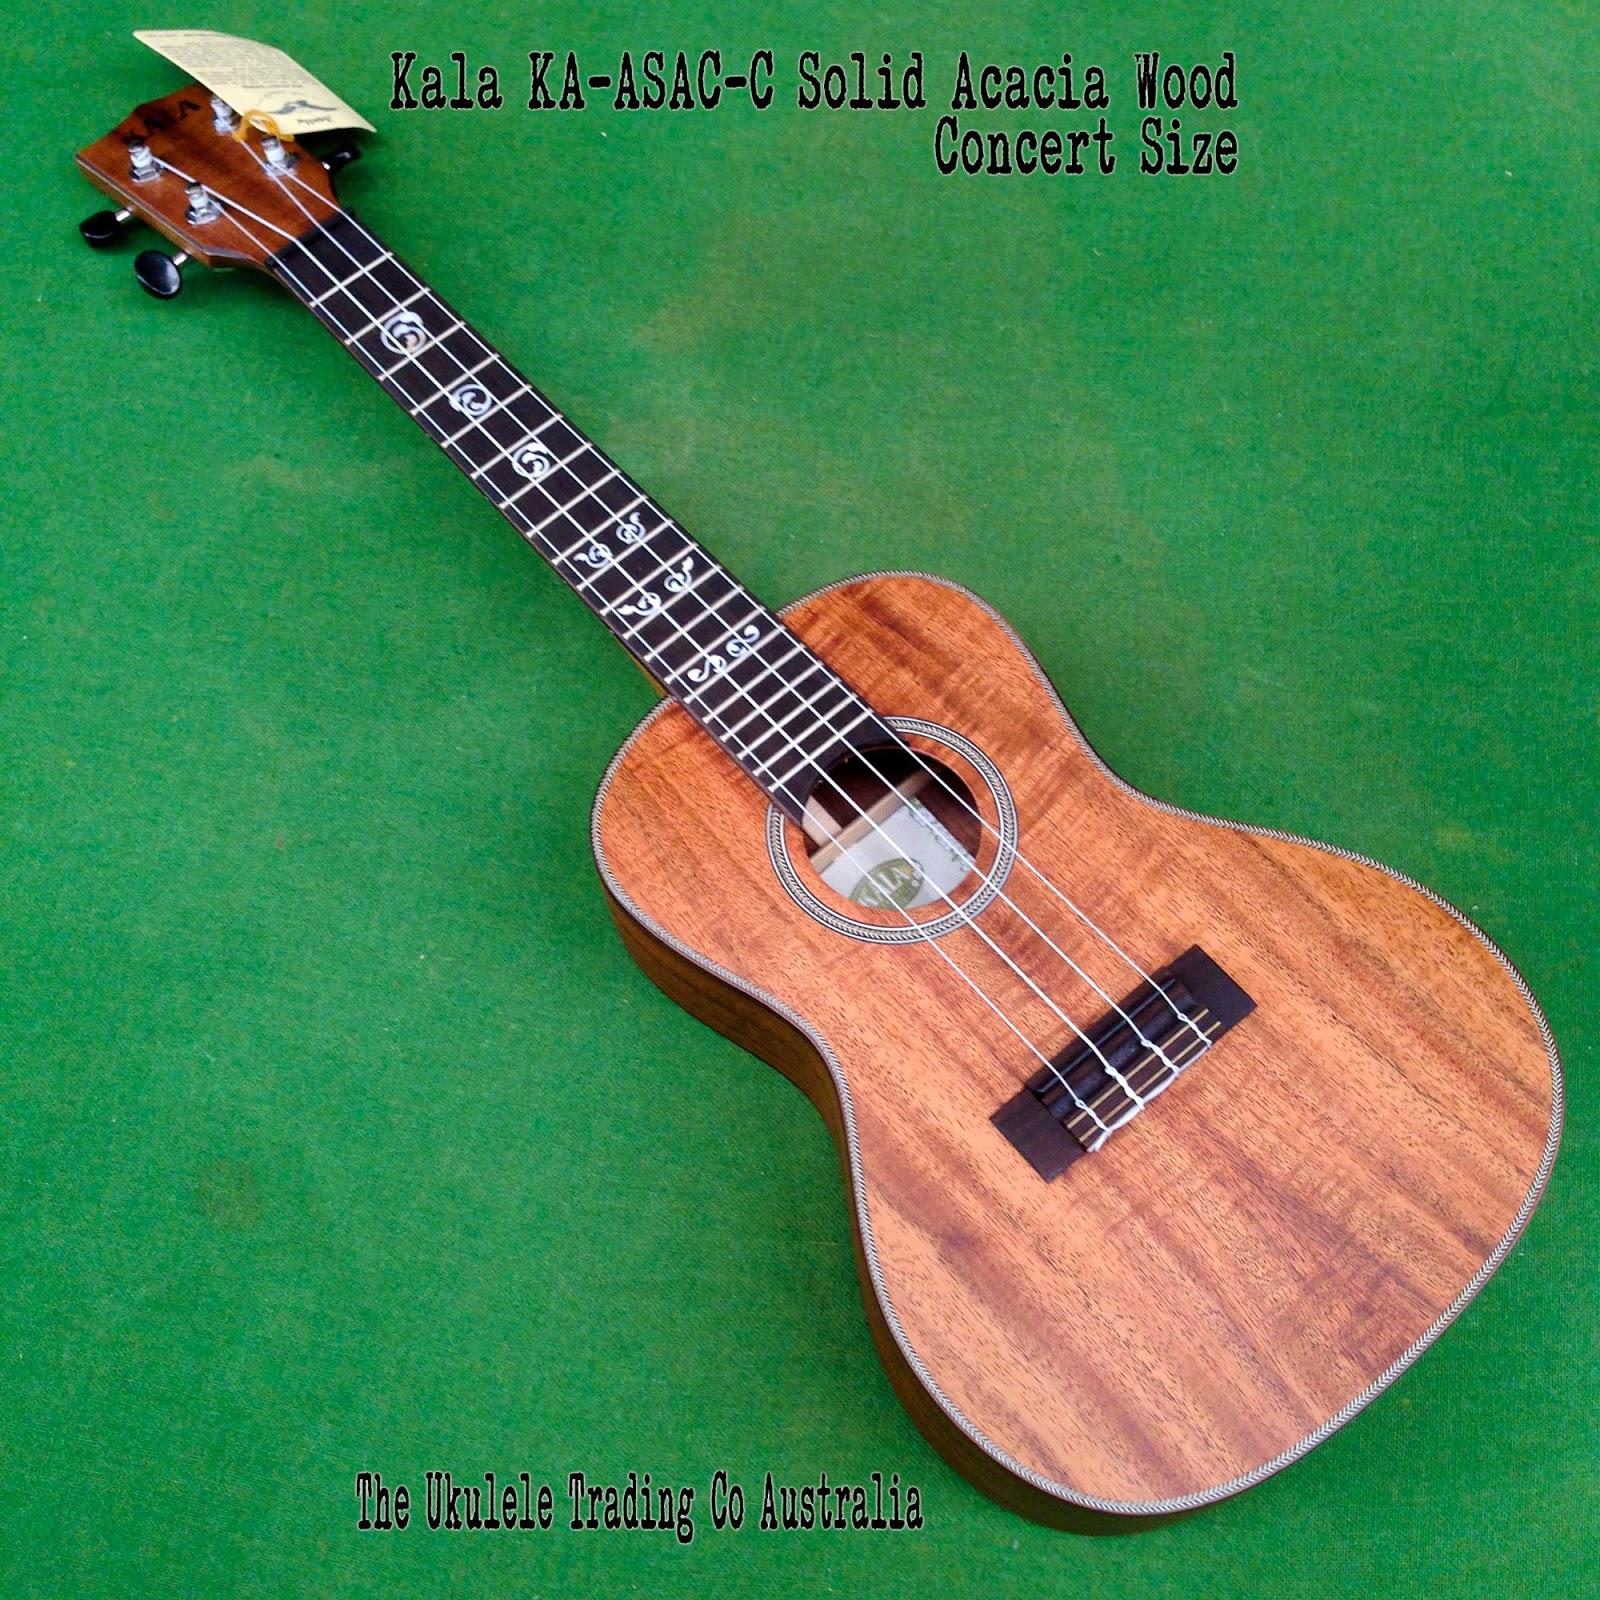 Kala KA-ASAC-C Solid Acacia Wood Concert Size ukulele, It's